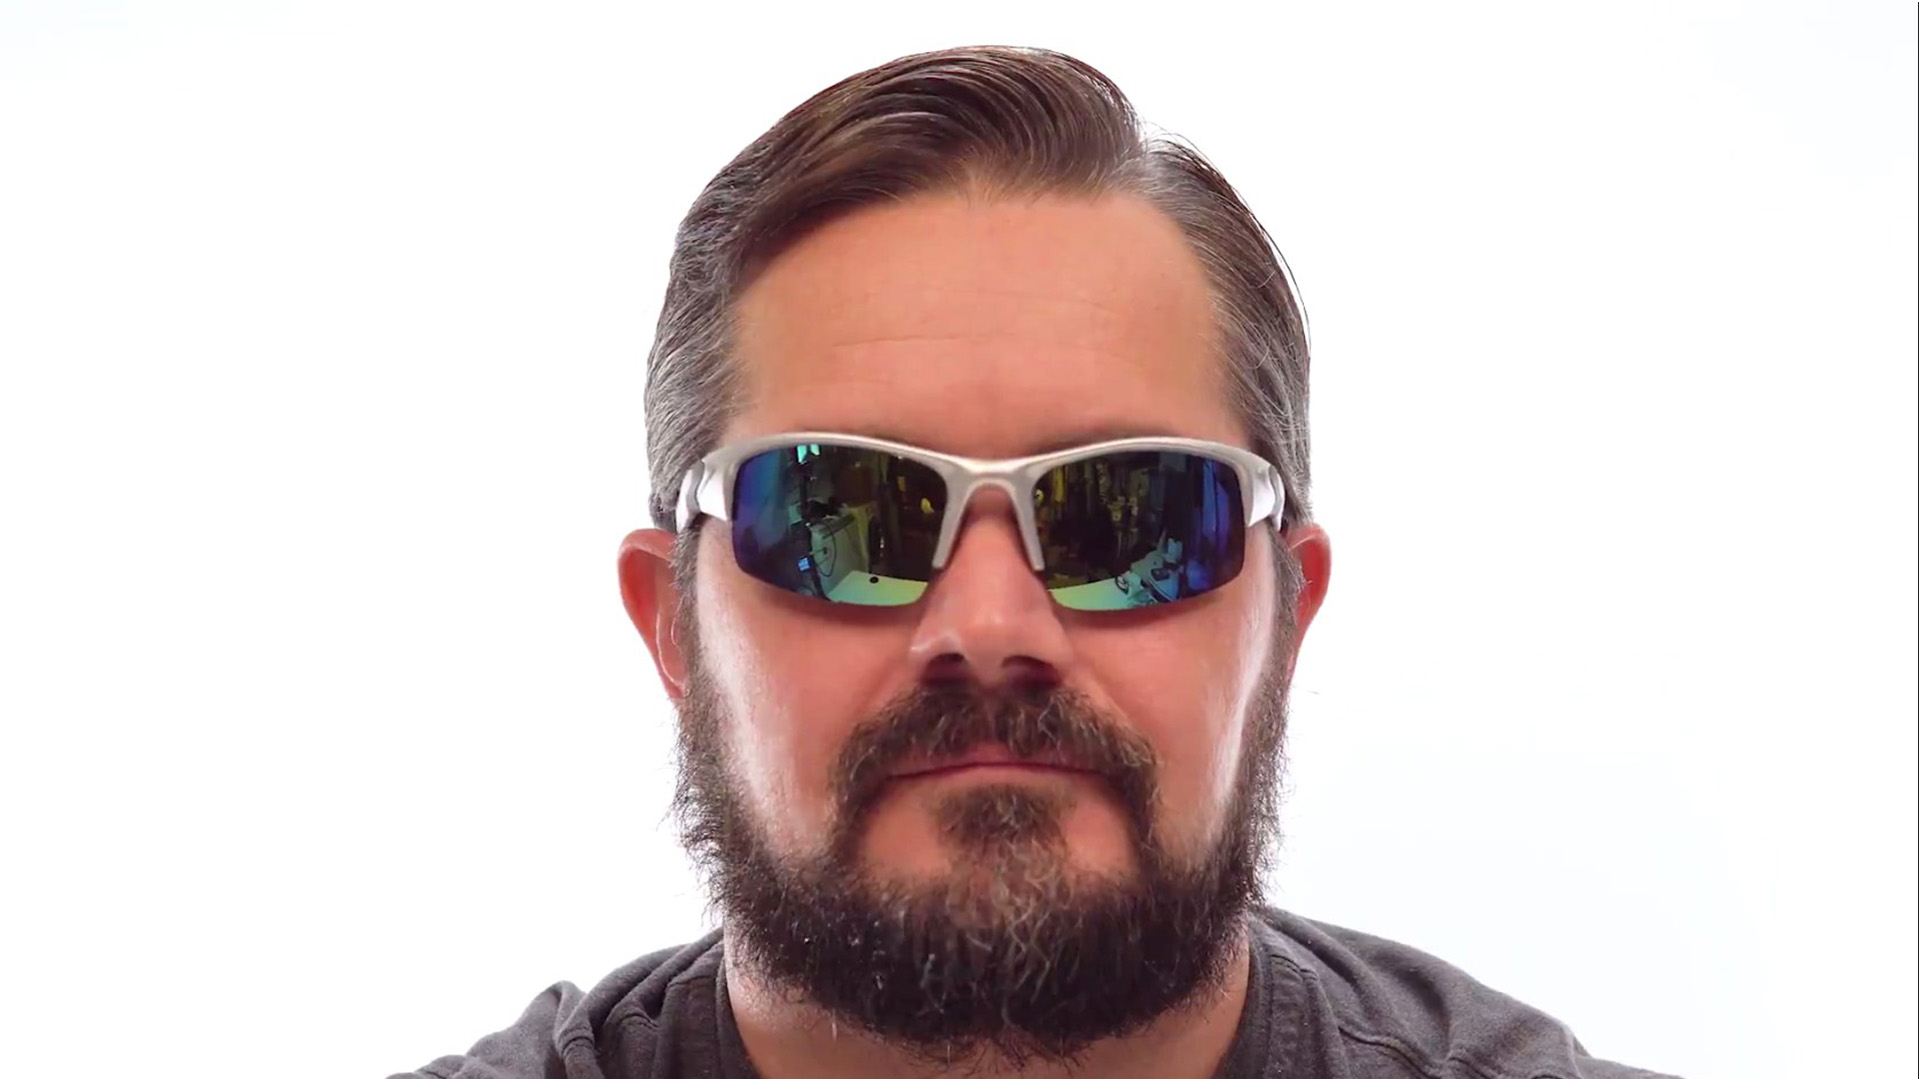 Norfork Prescription Sports Sunglasses